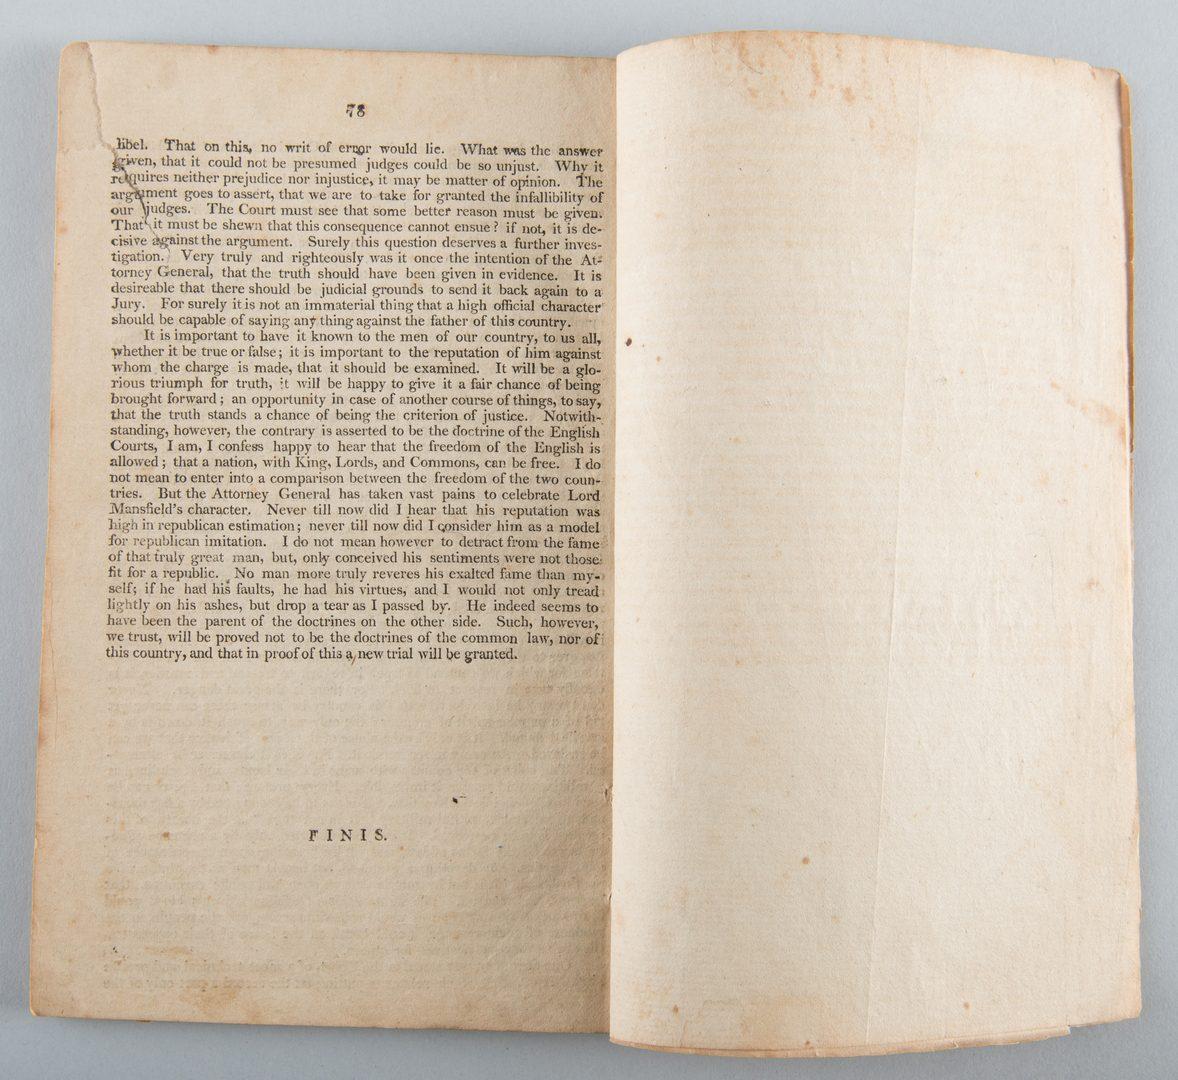 Lot 560: Pamphlet from Jefferson Libel Case, 1804